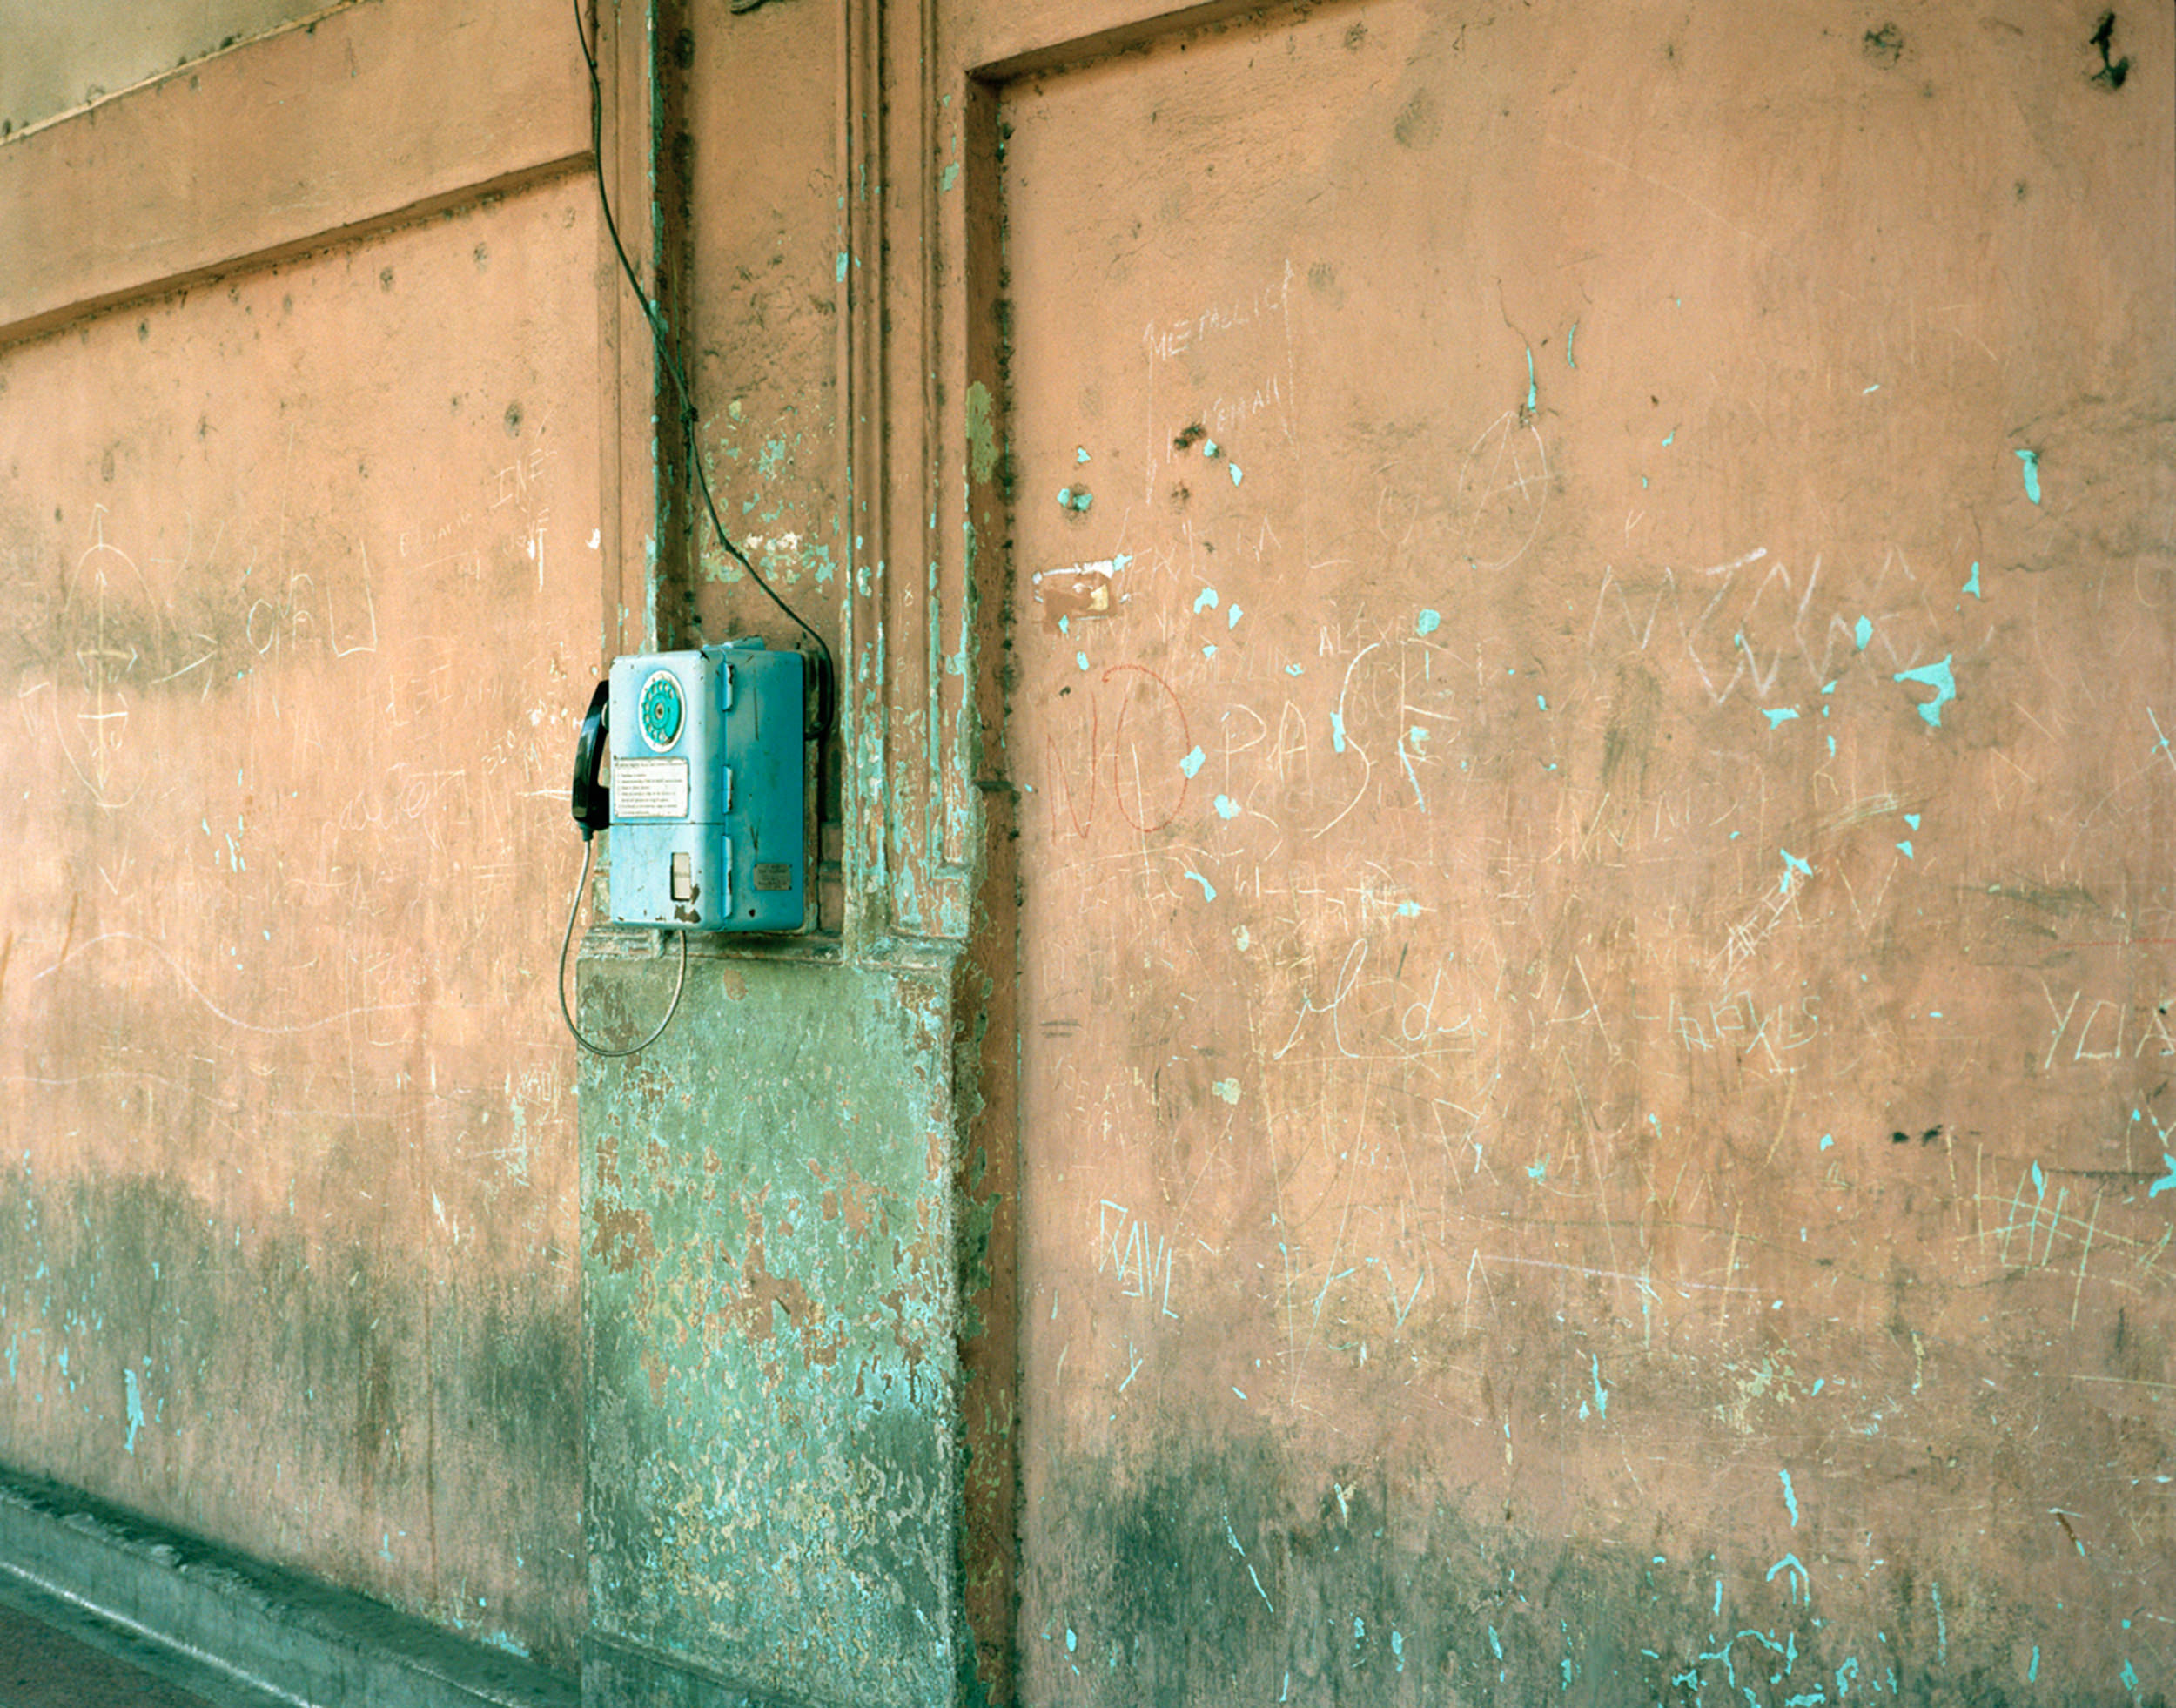 18.95-PhoneHavana- 001.jpg